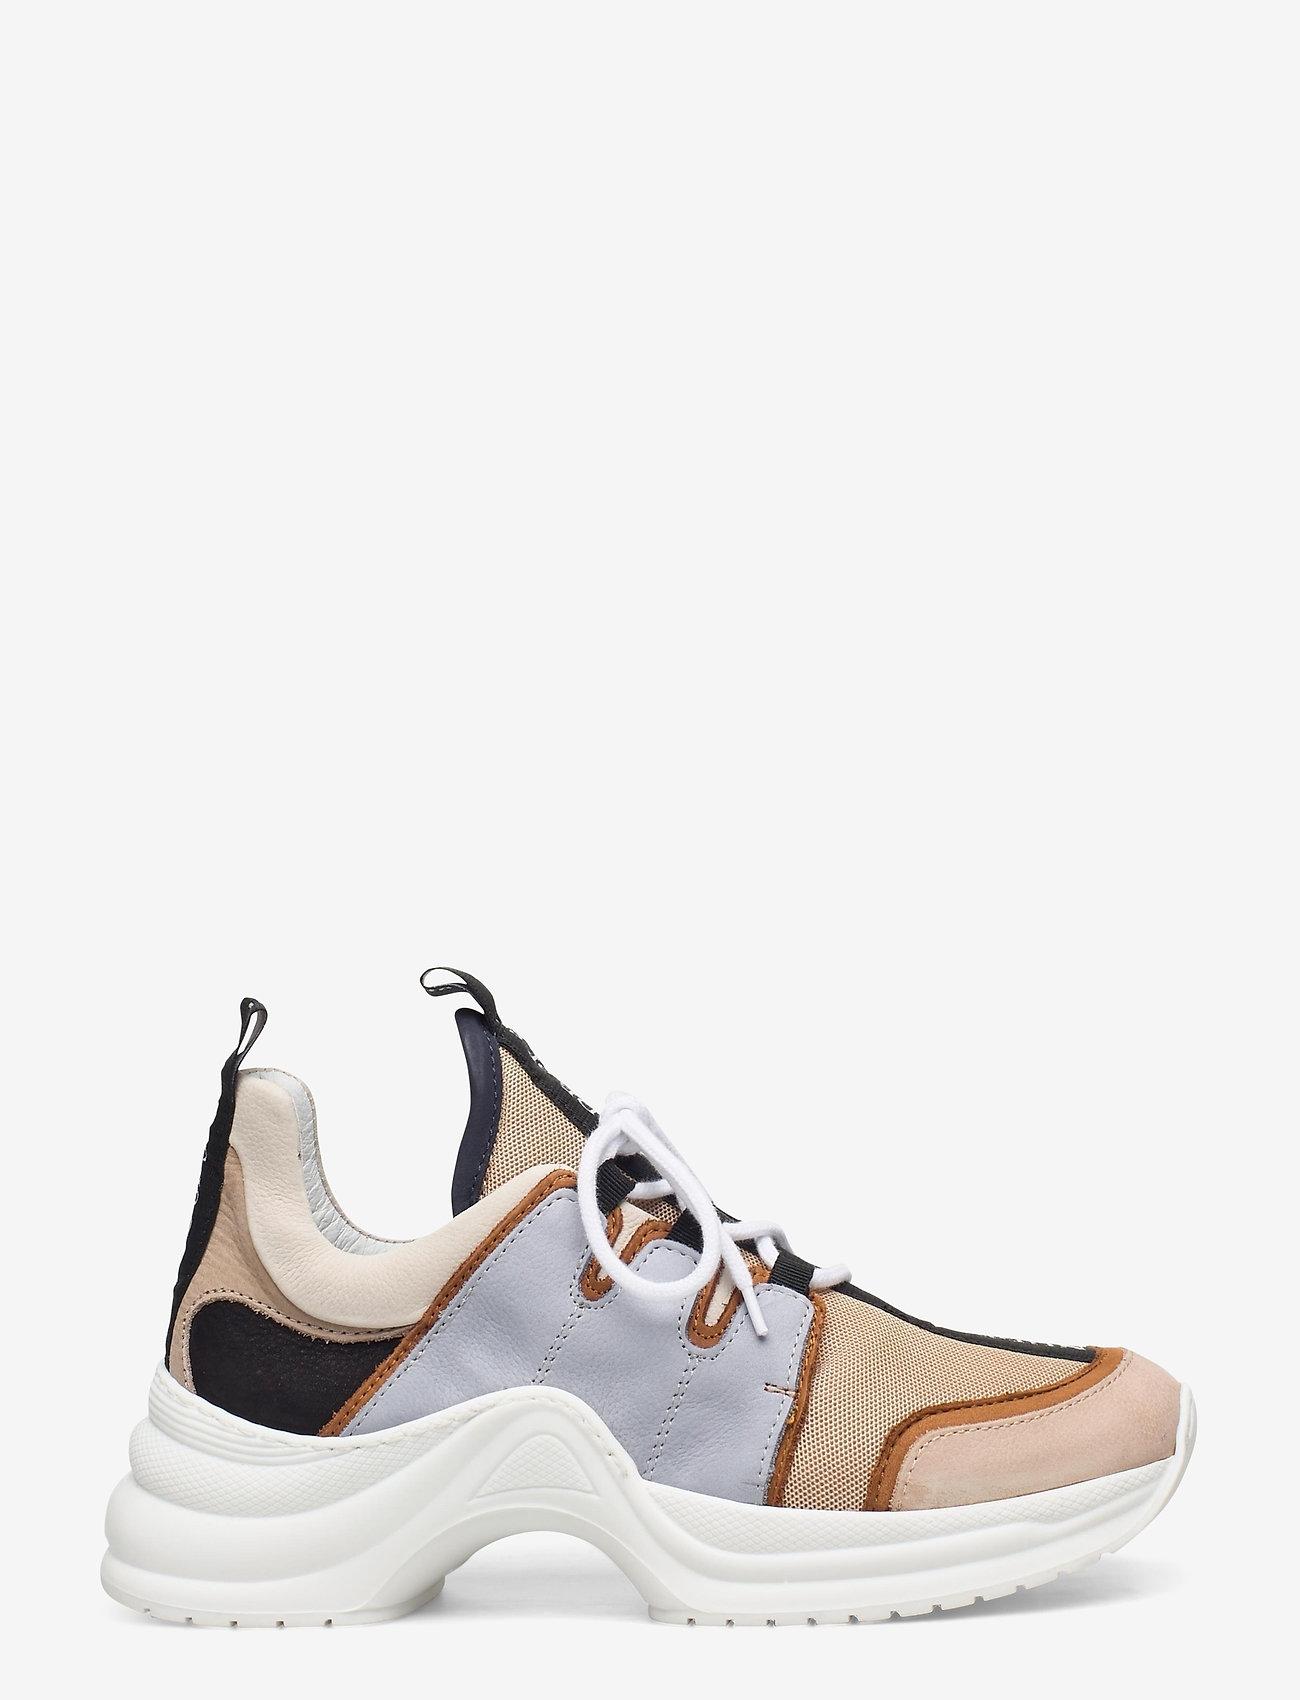 Nude of Scandinavia - JOY - chunky sneakers - mix / polvere - 1